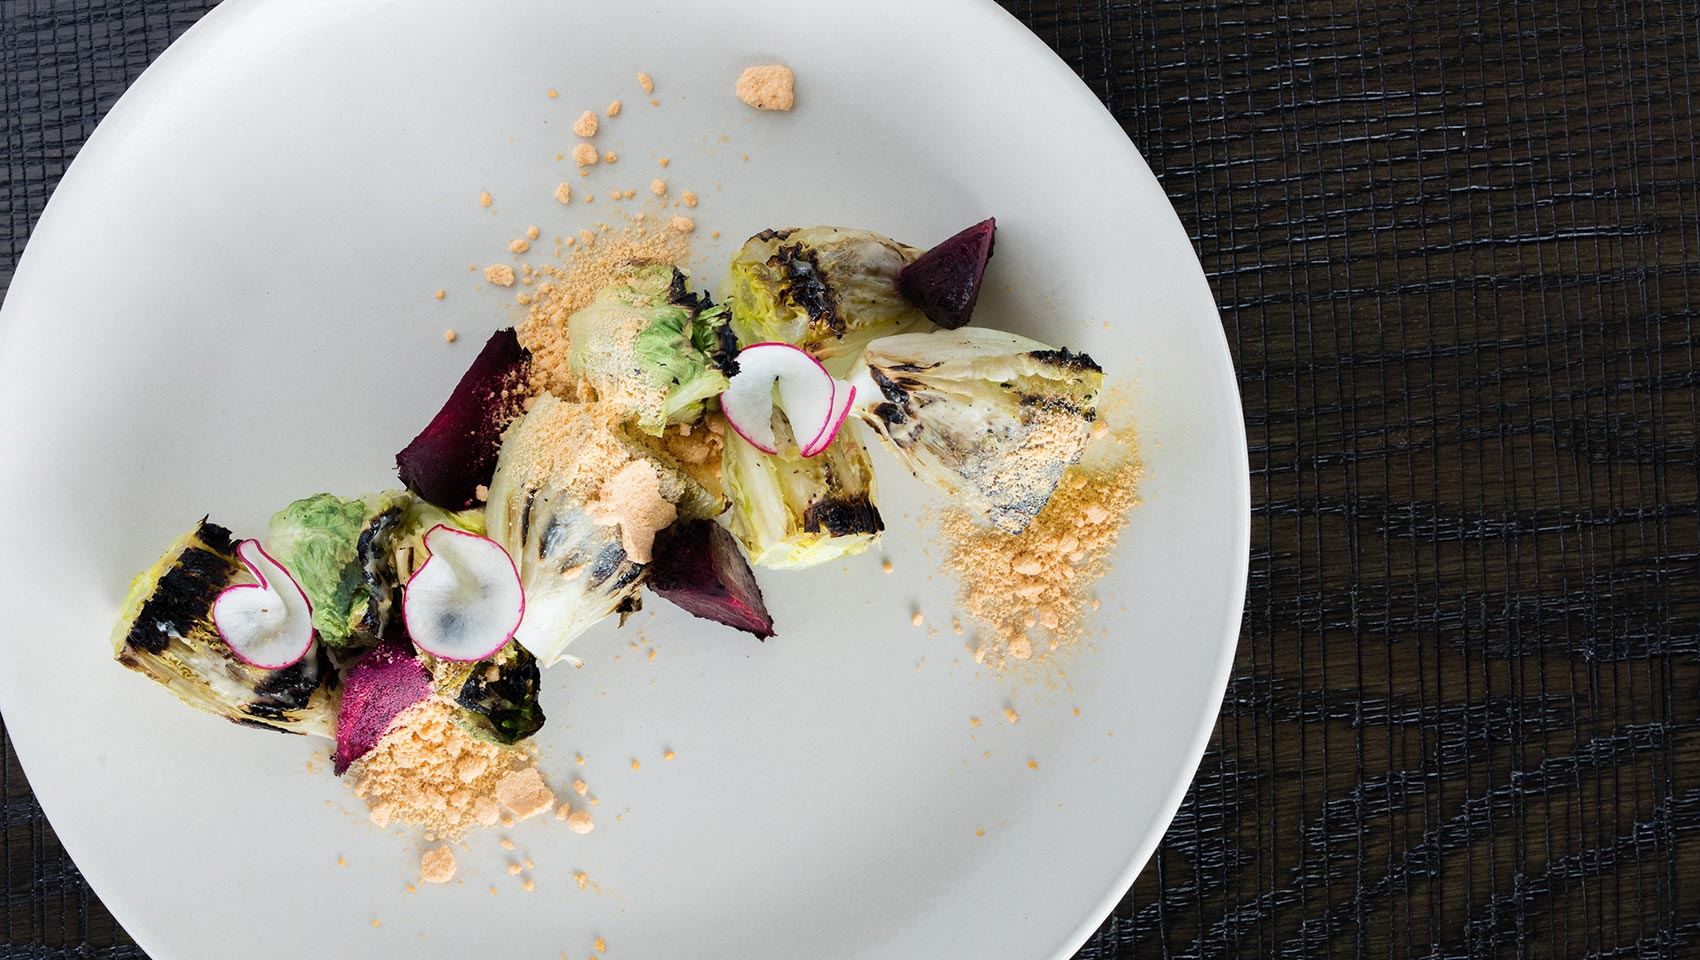 Avecita Salad with Roast Beets